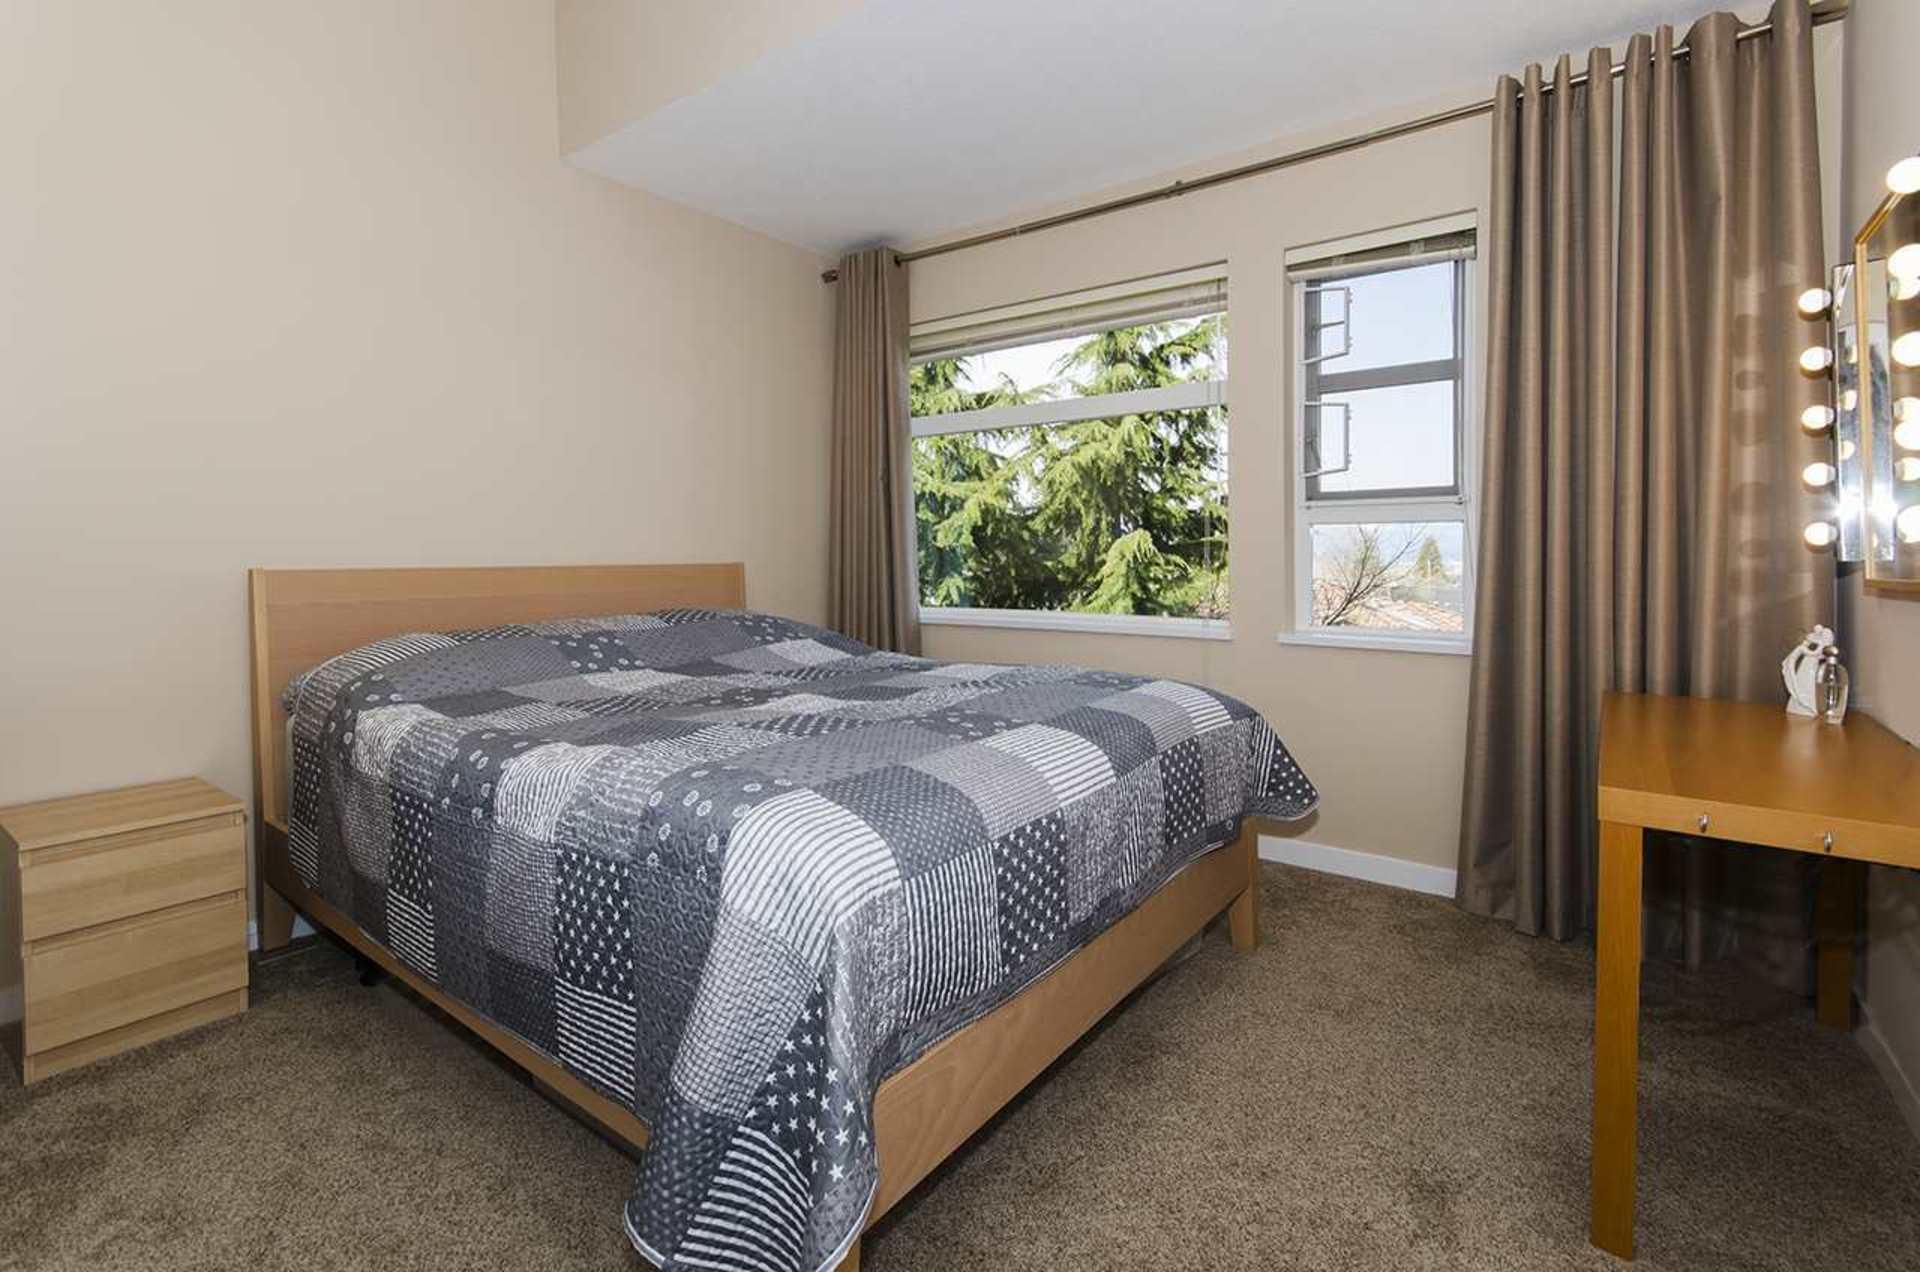 6508-denbigh-avenue-forest-glen-bs-burnaby-south-10 at 318 - 6508 Denbigh Avenue, Forest Glen BS, Burnaby South